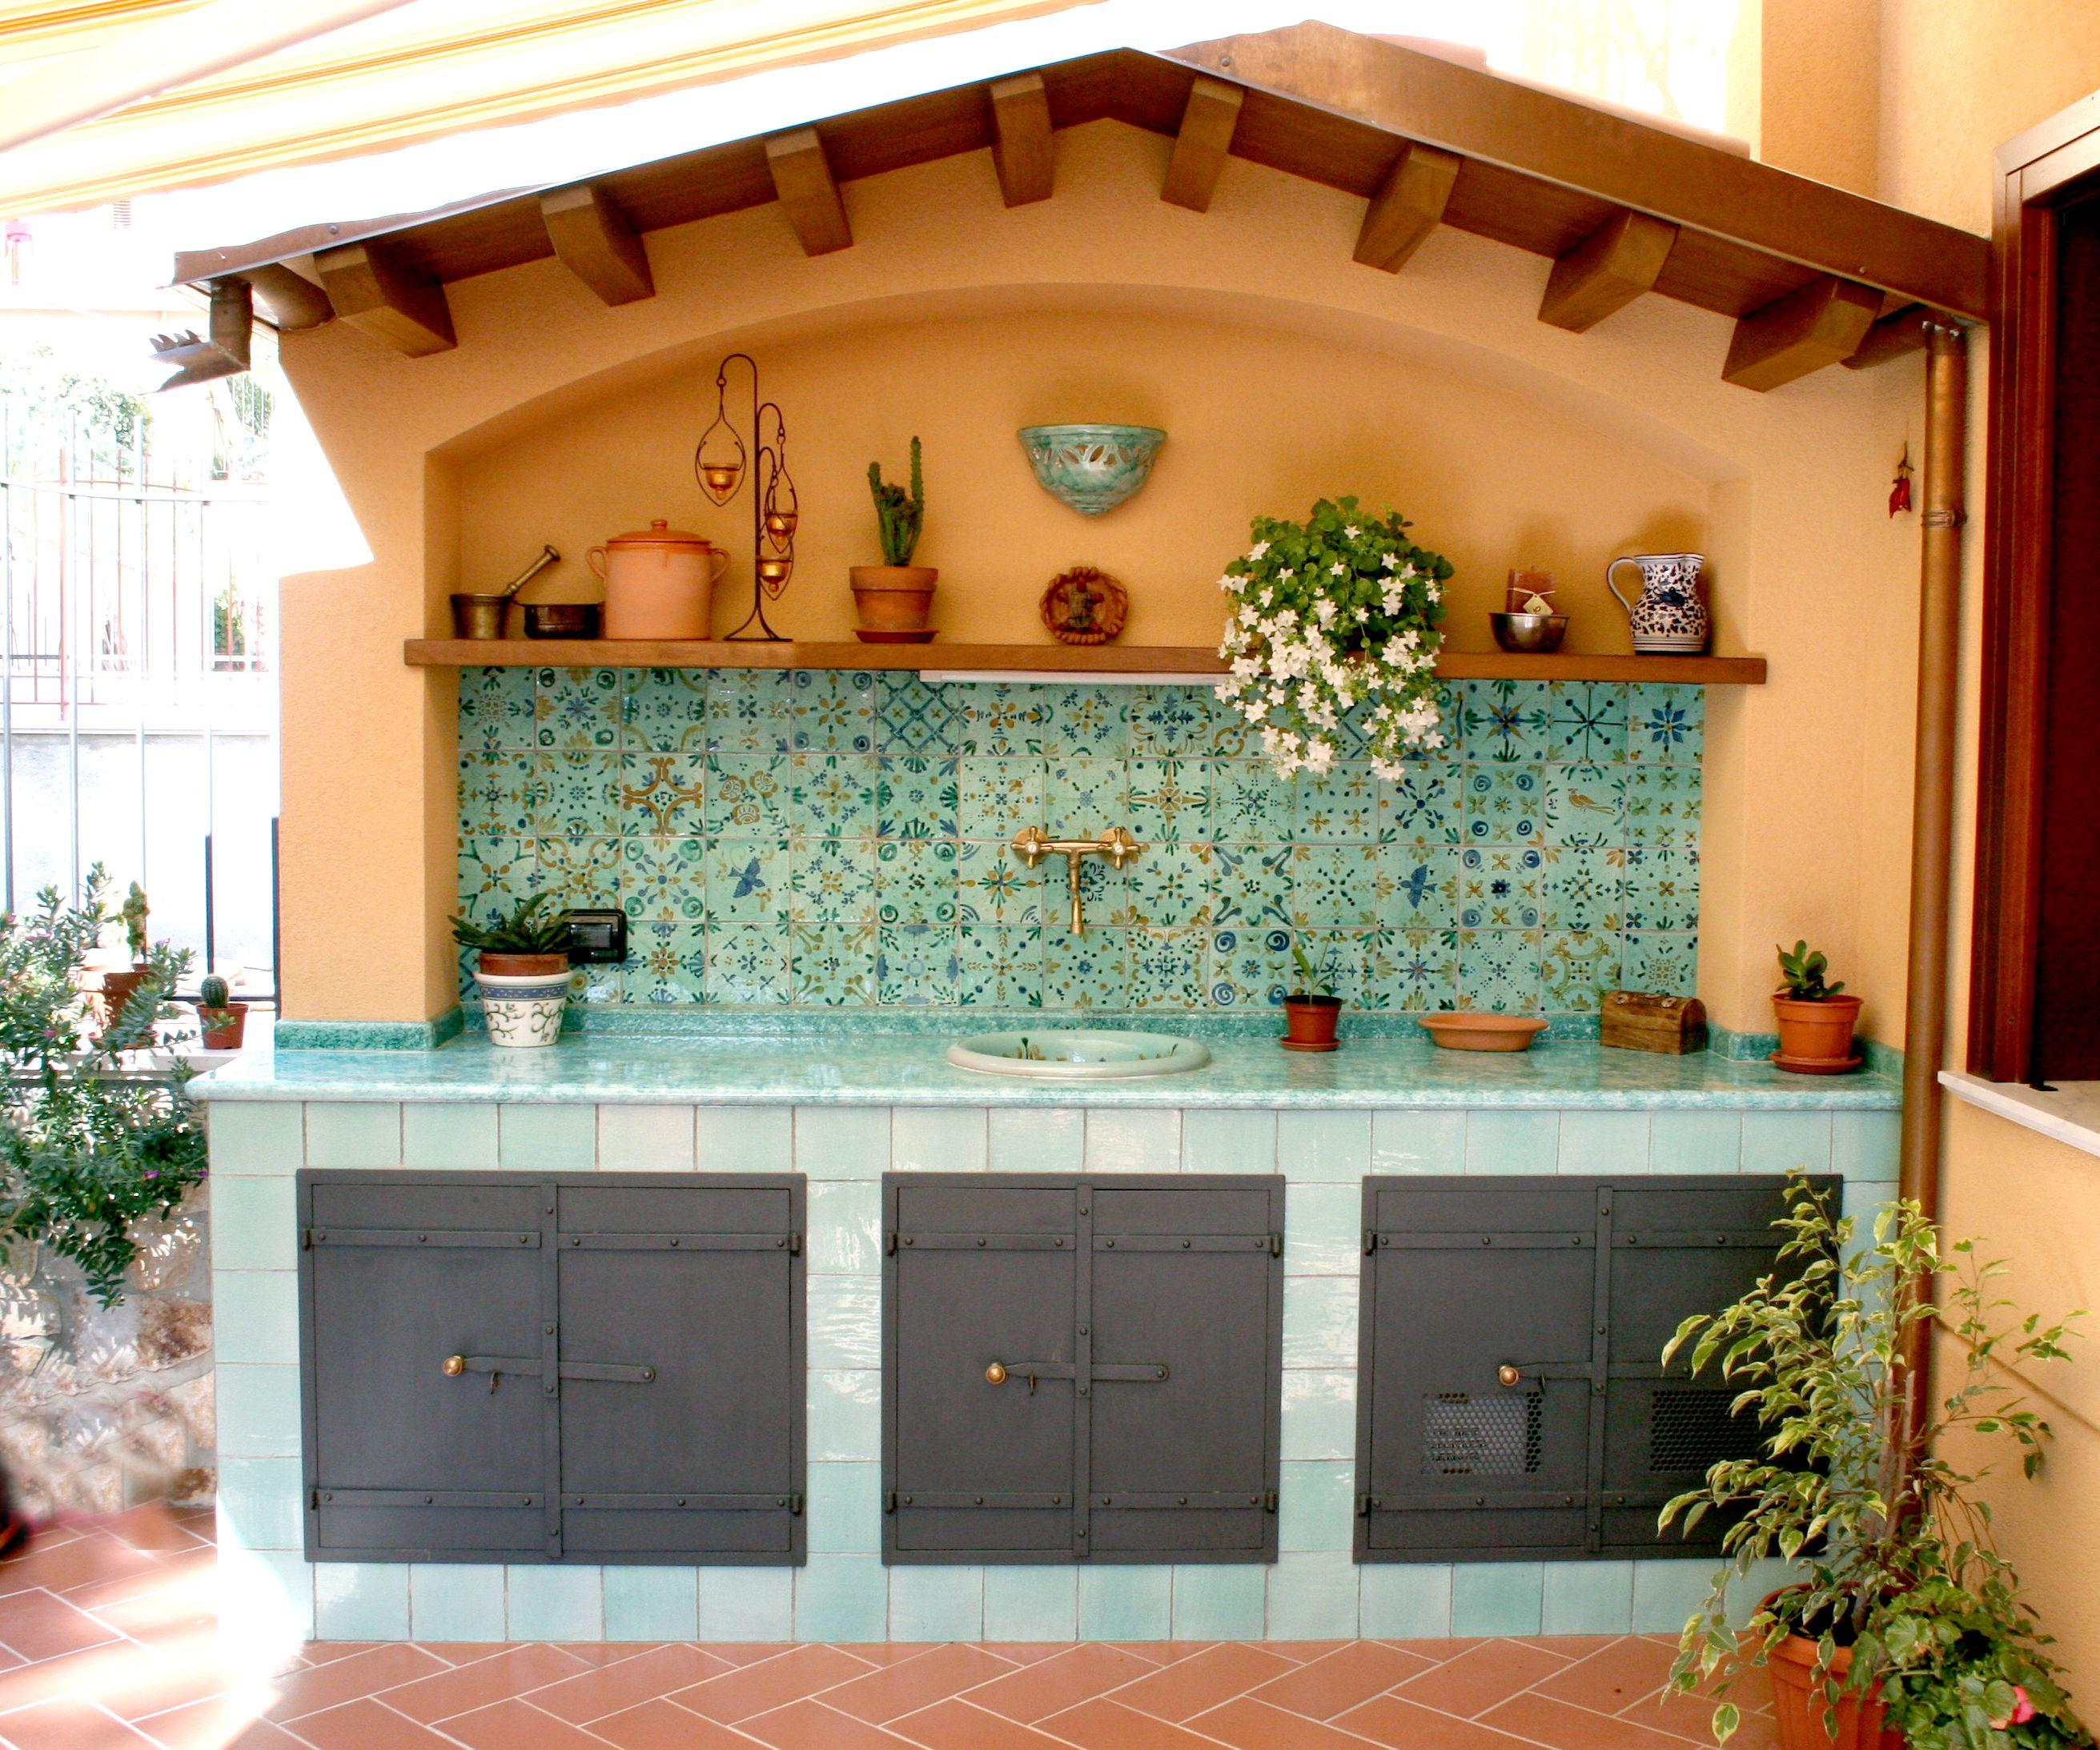 Top Per Cucina Esterna ~ Idee Creative di Interni e Mobili